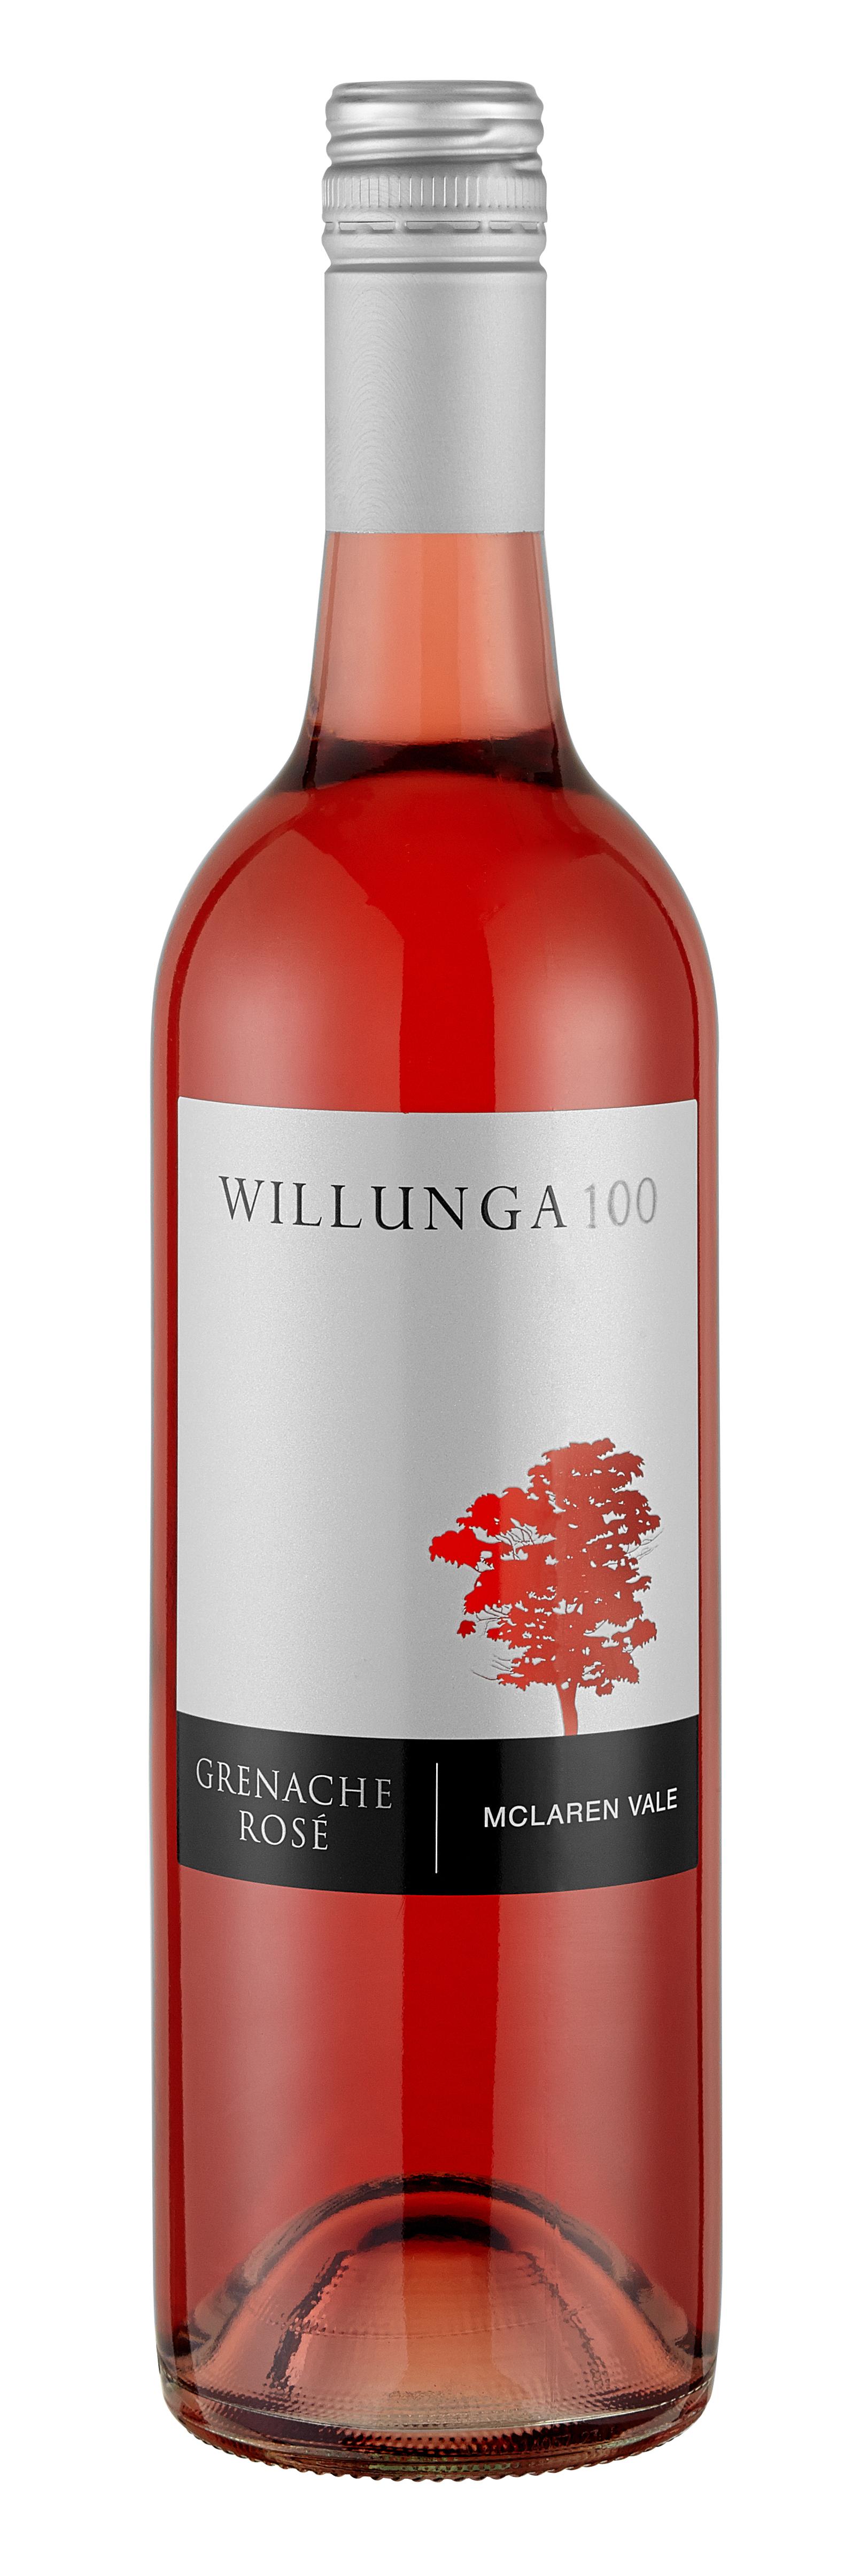 Willunga 100, Grenache Rosé 2015